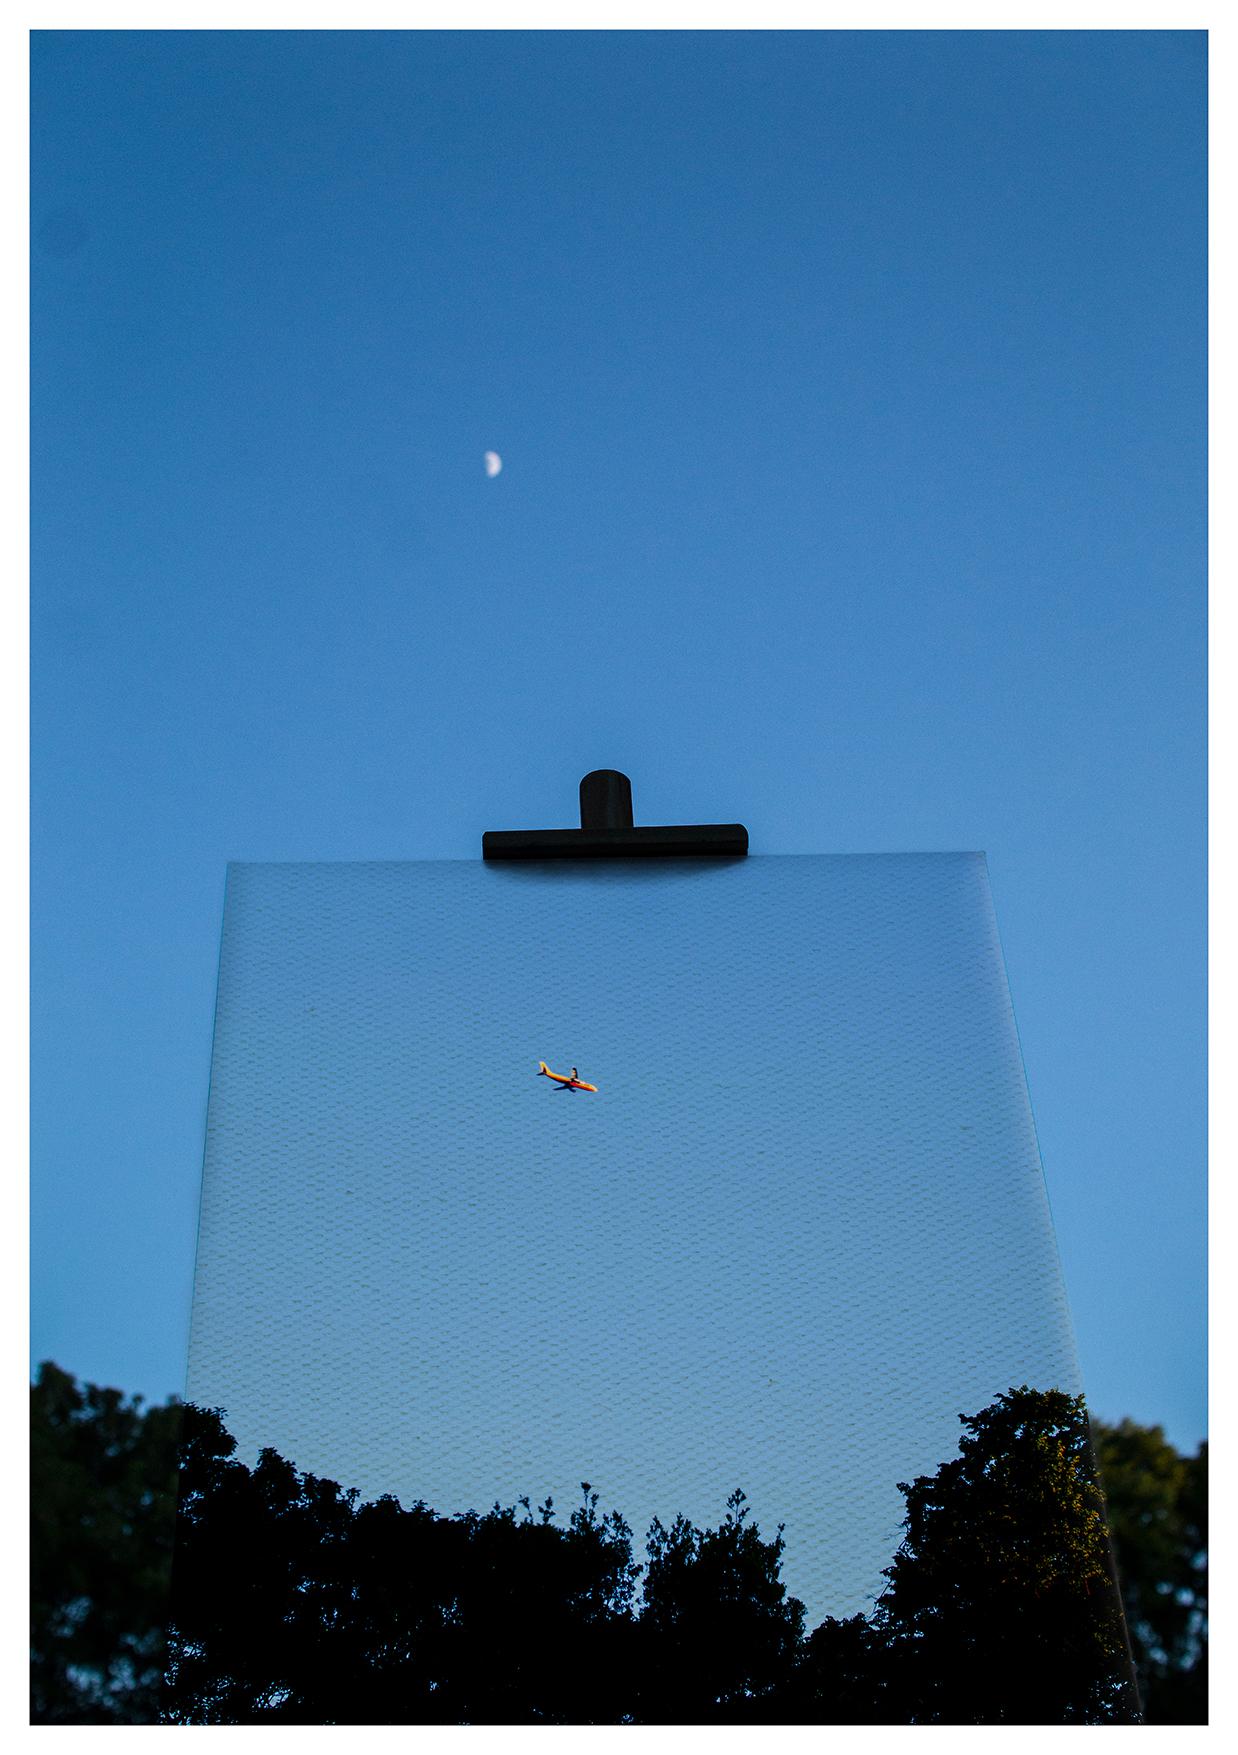 sky_plane_A2_fin_small.jpg